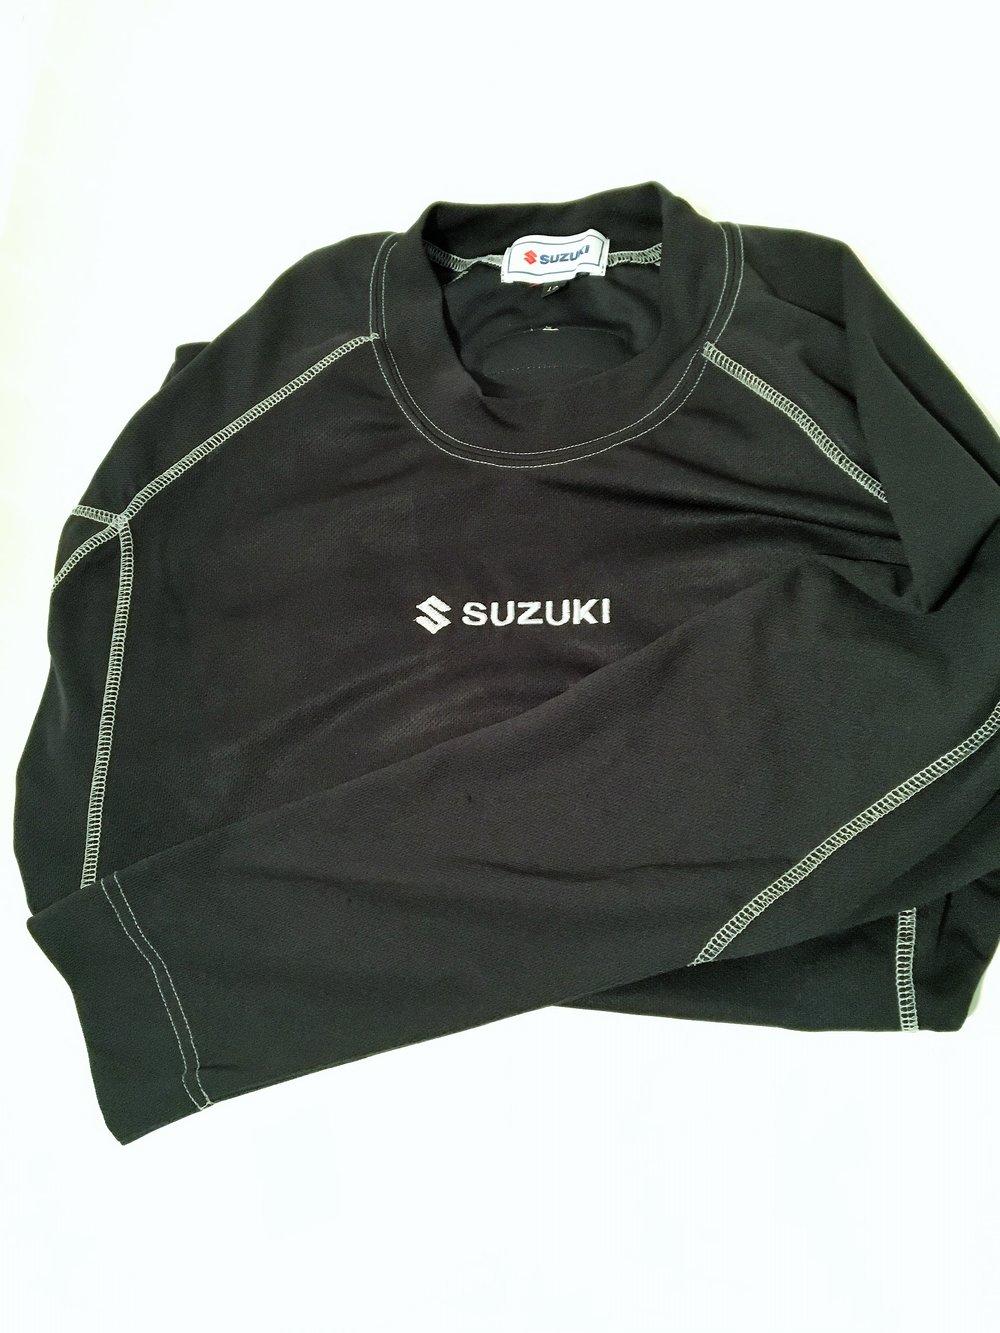 Suzuki L/S T $15